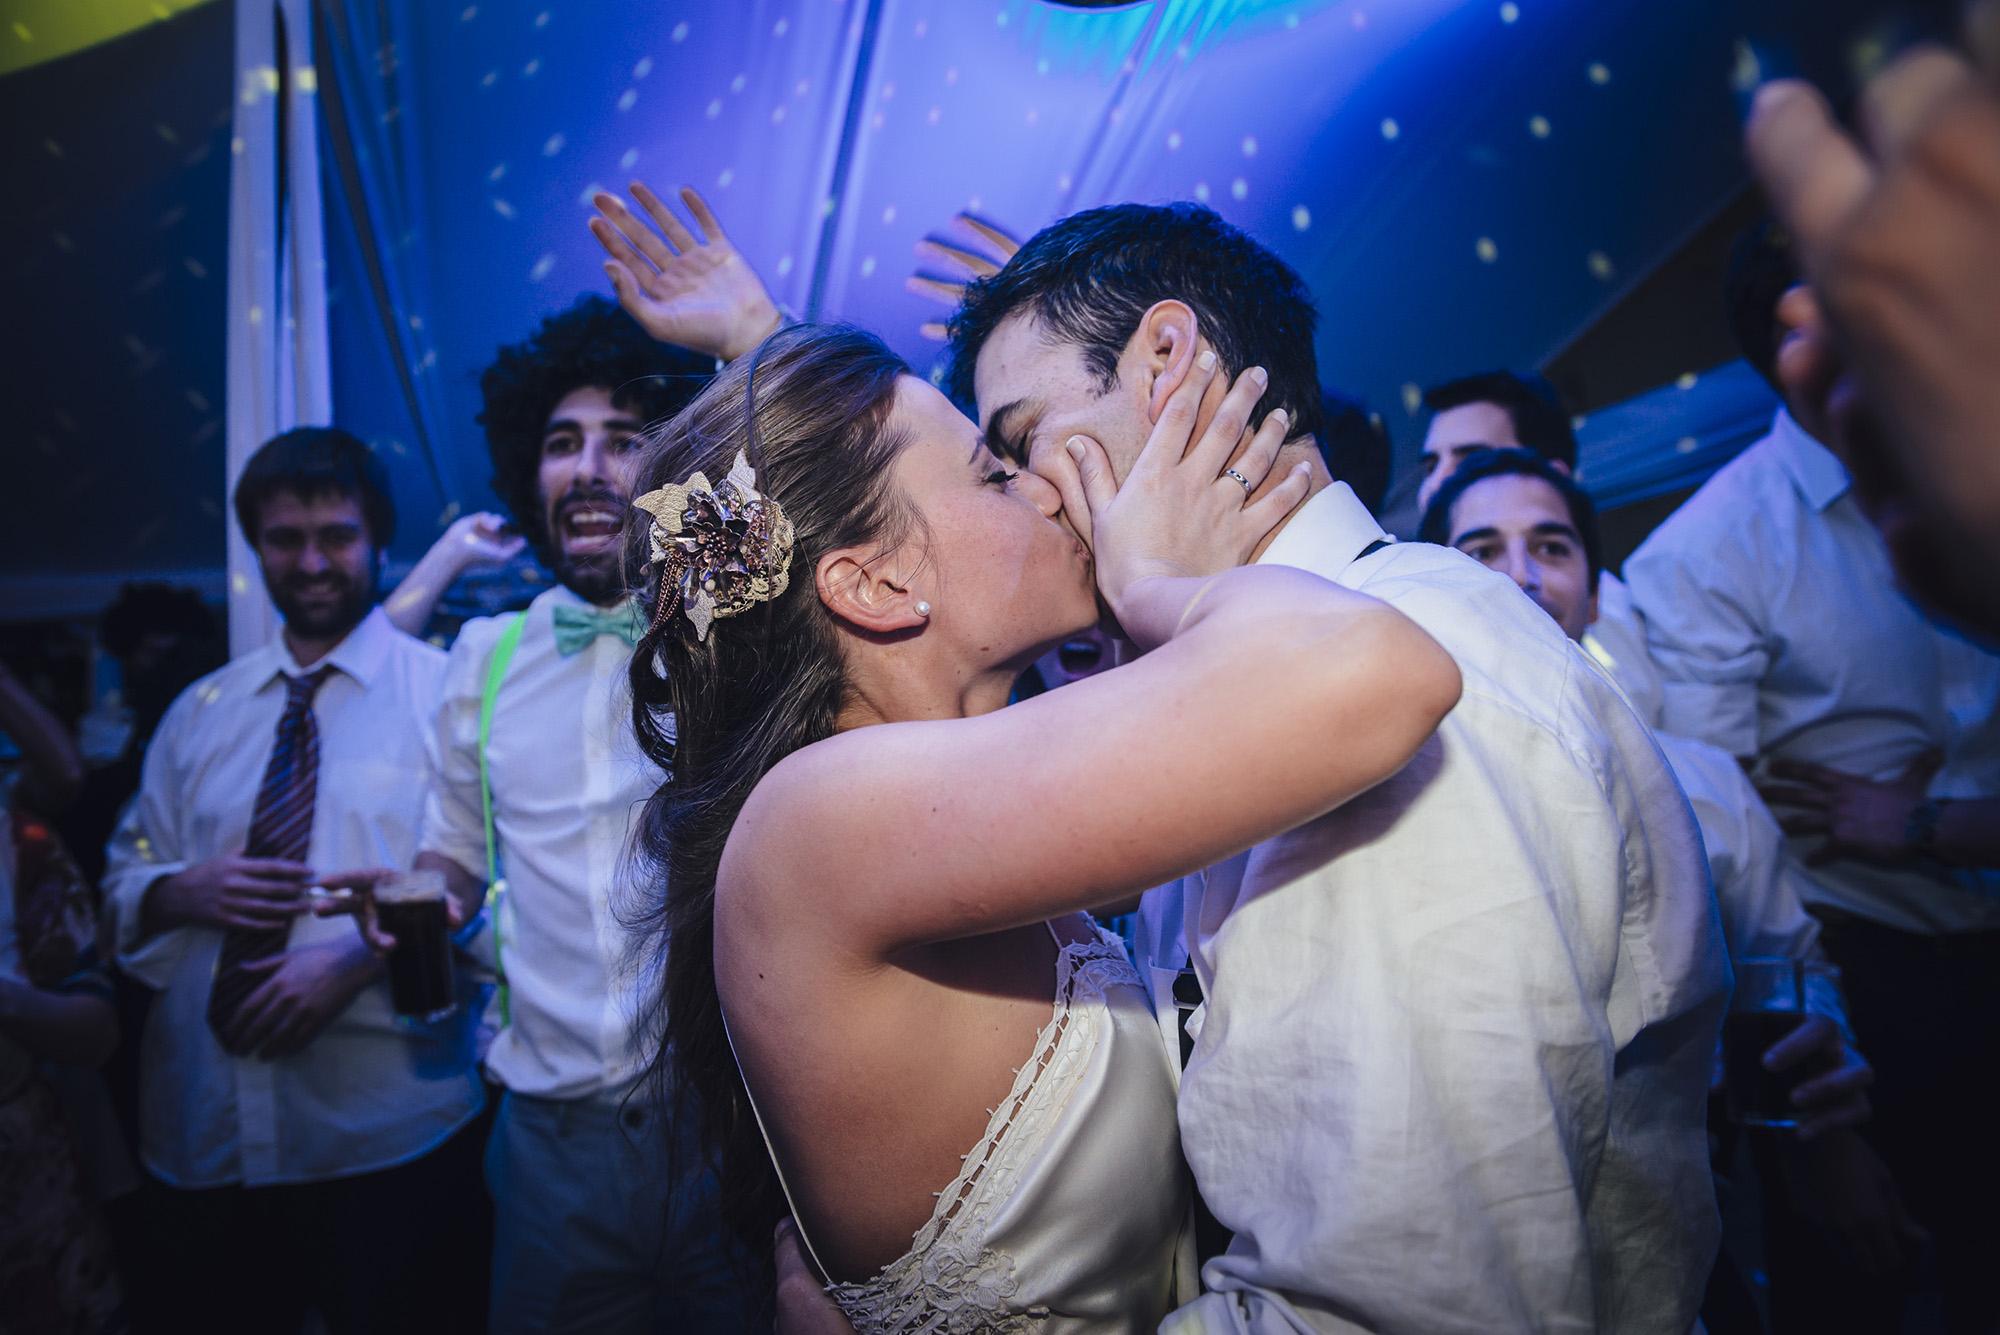 patricia-riba-casamiento-montevideo-uruguay-lindolfo-87